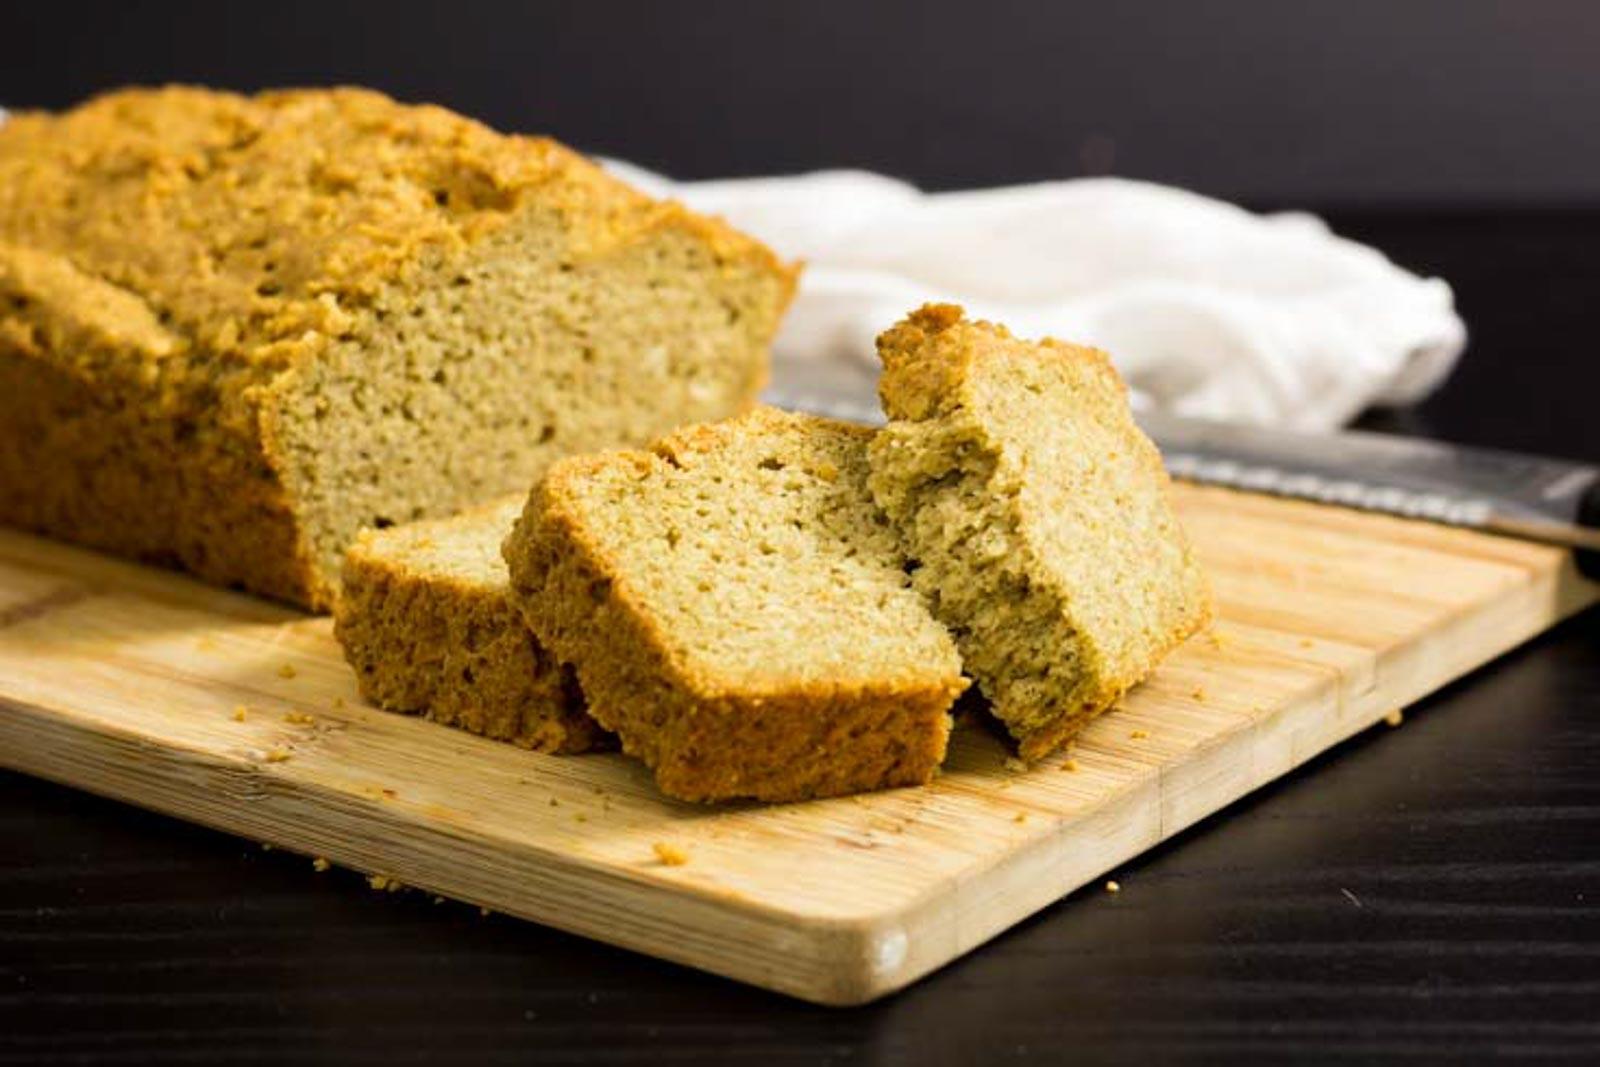 Schnelles ketogenes Low Carb Brot glutenfrei backen ohne Mehl salala.de